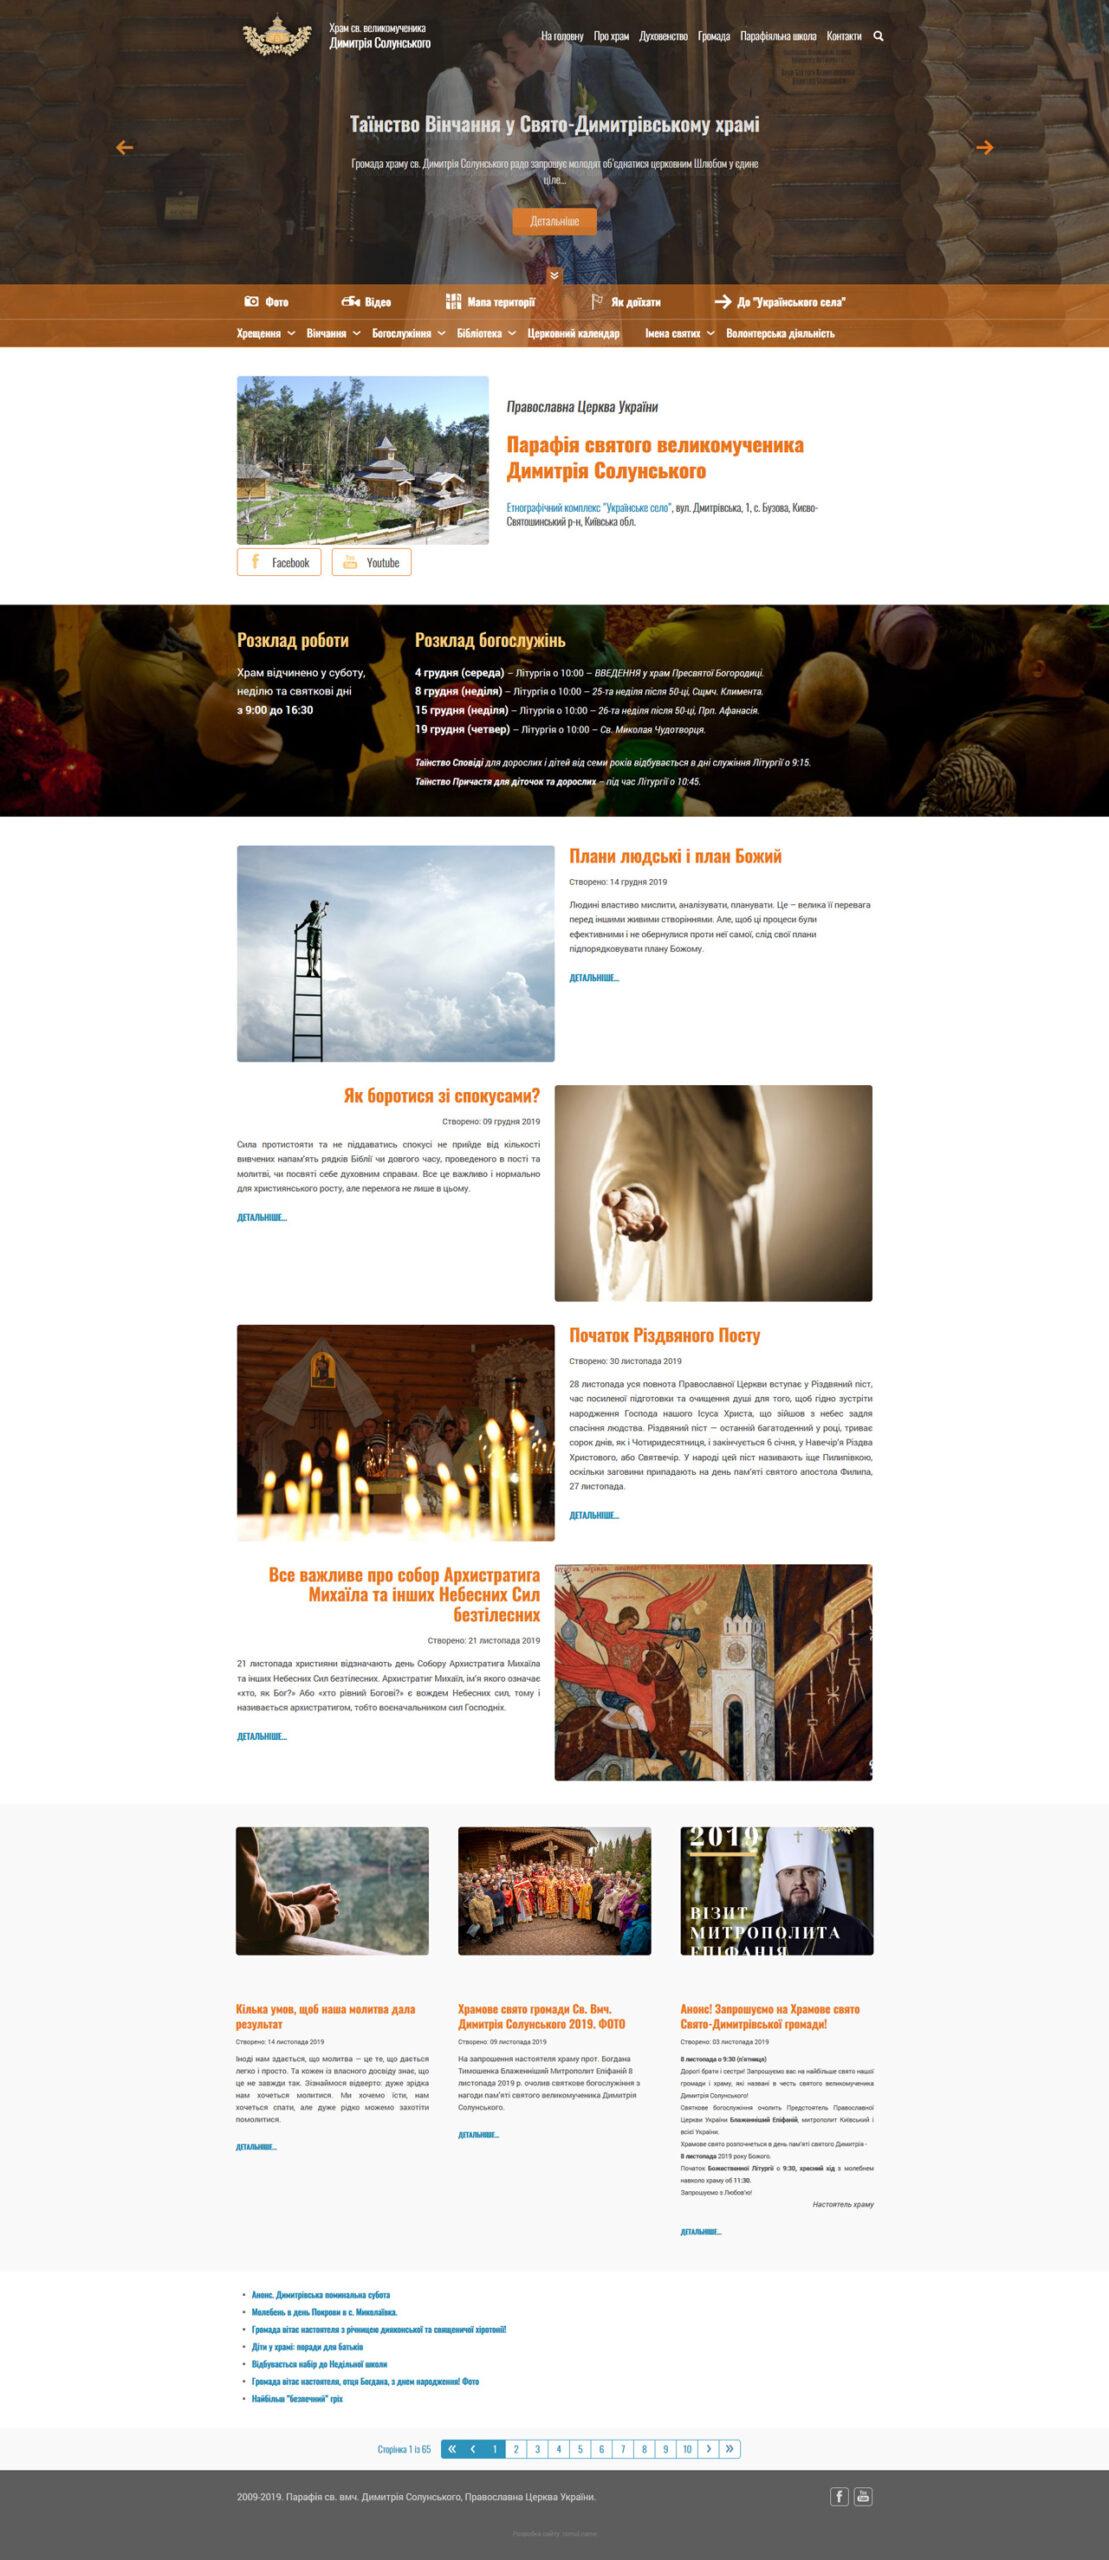 Редизайн сайта Храма